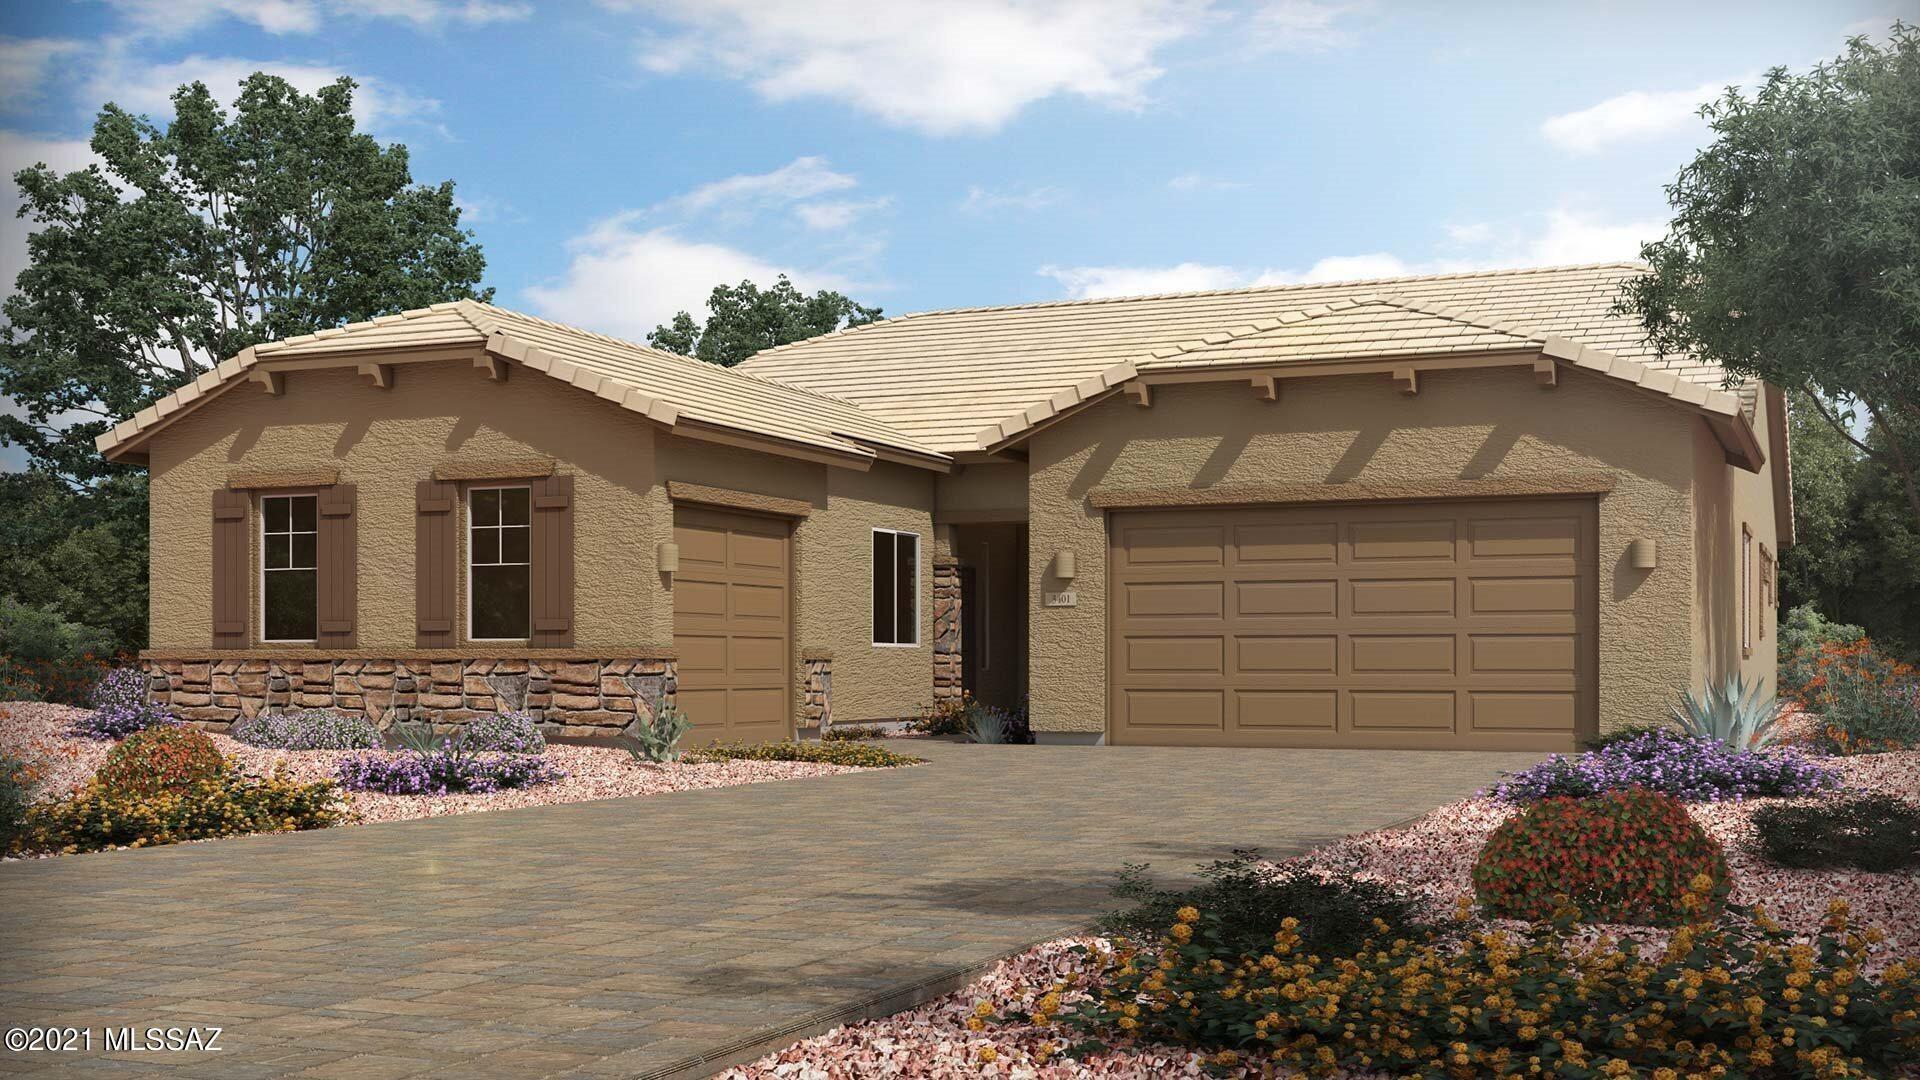 5176 W Glenstone Ct. Drive, Tucson, AZ 85742 - #: 22112193